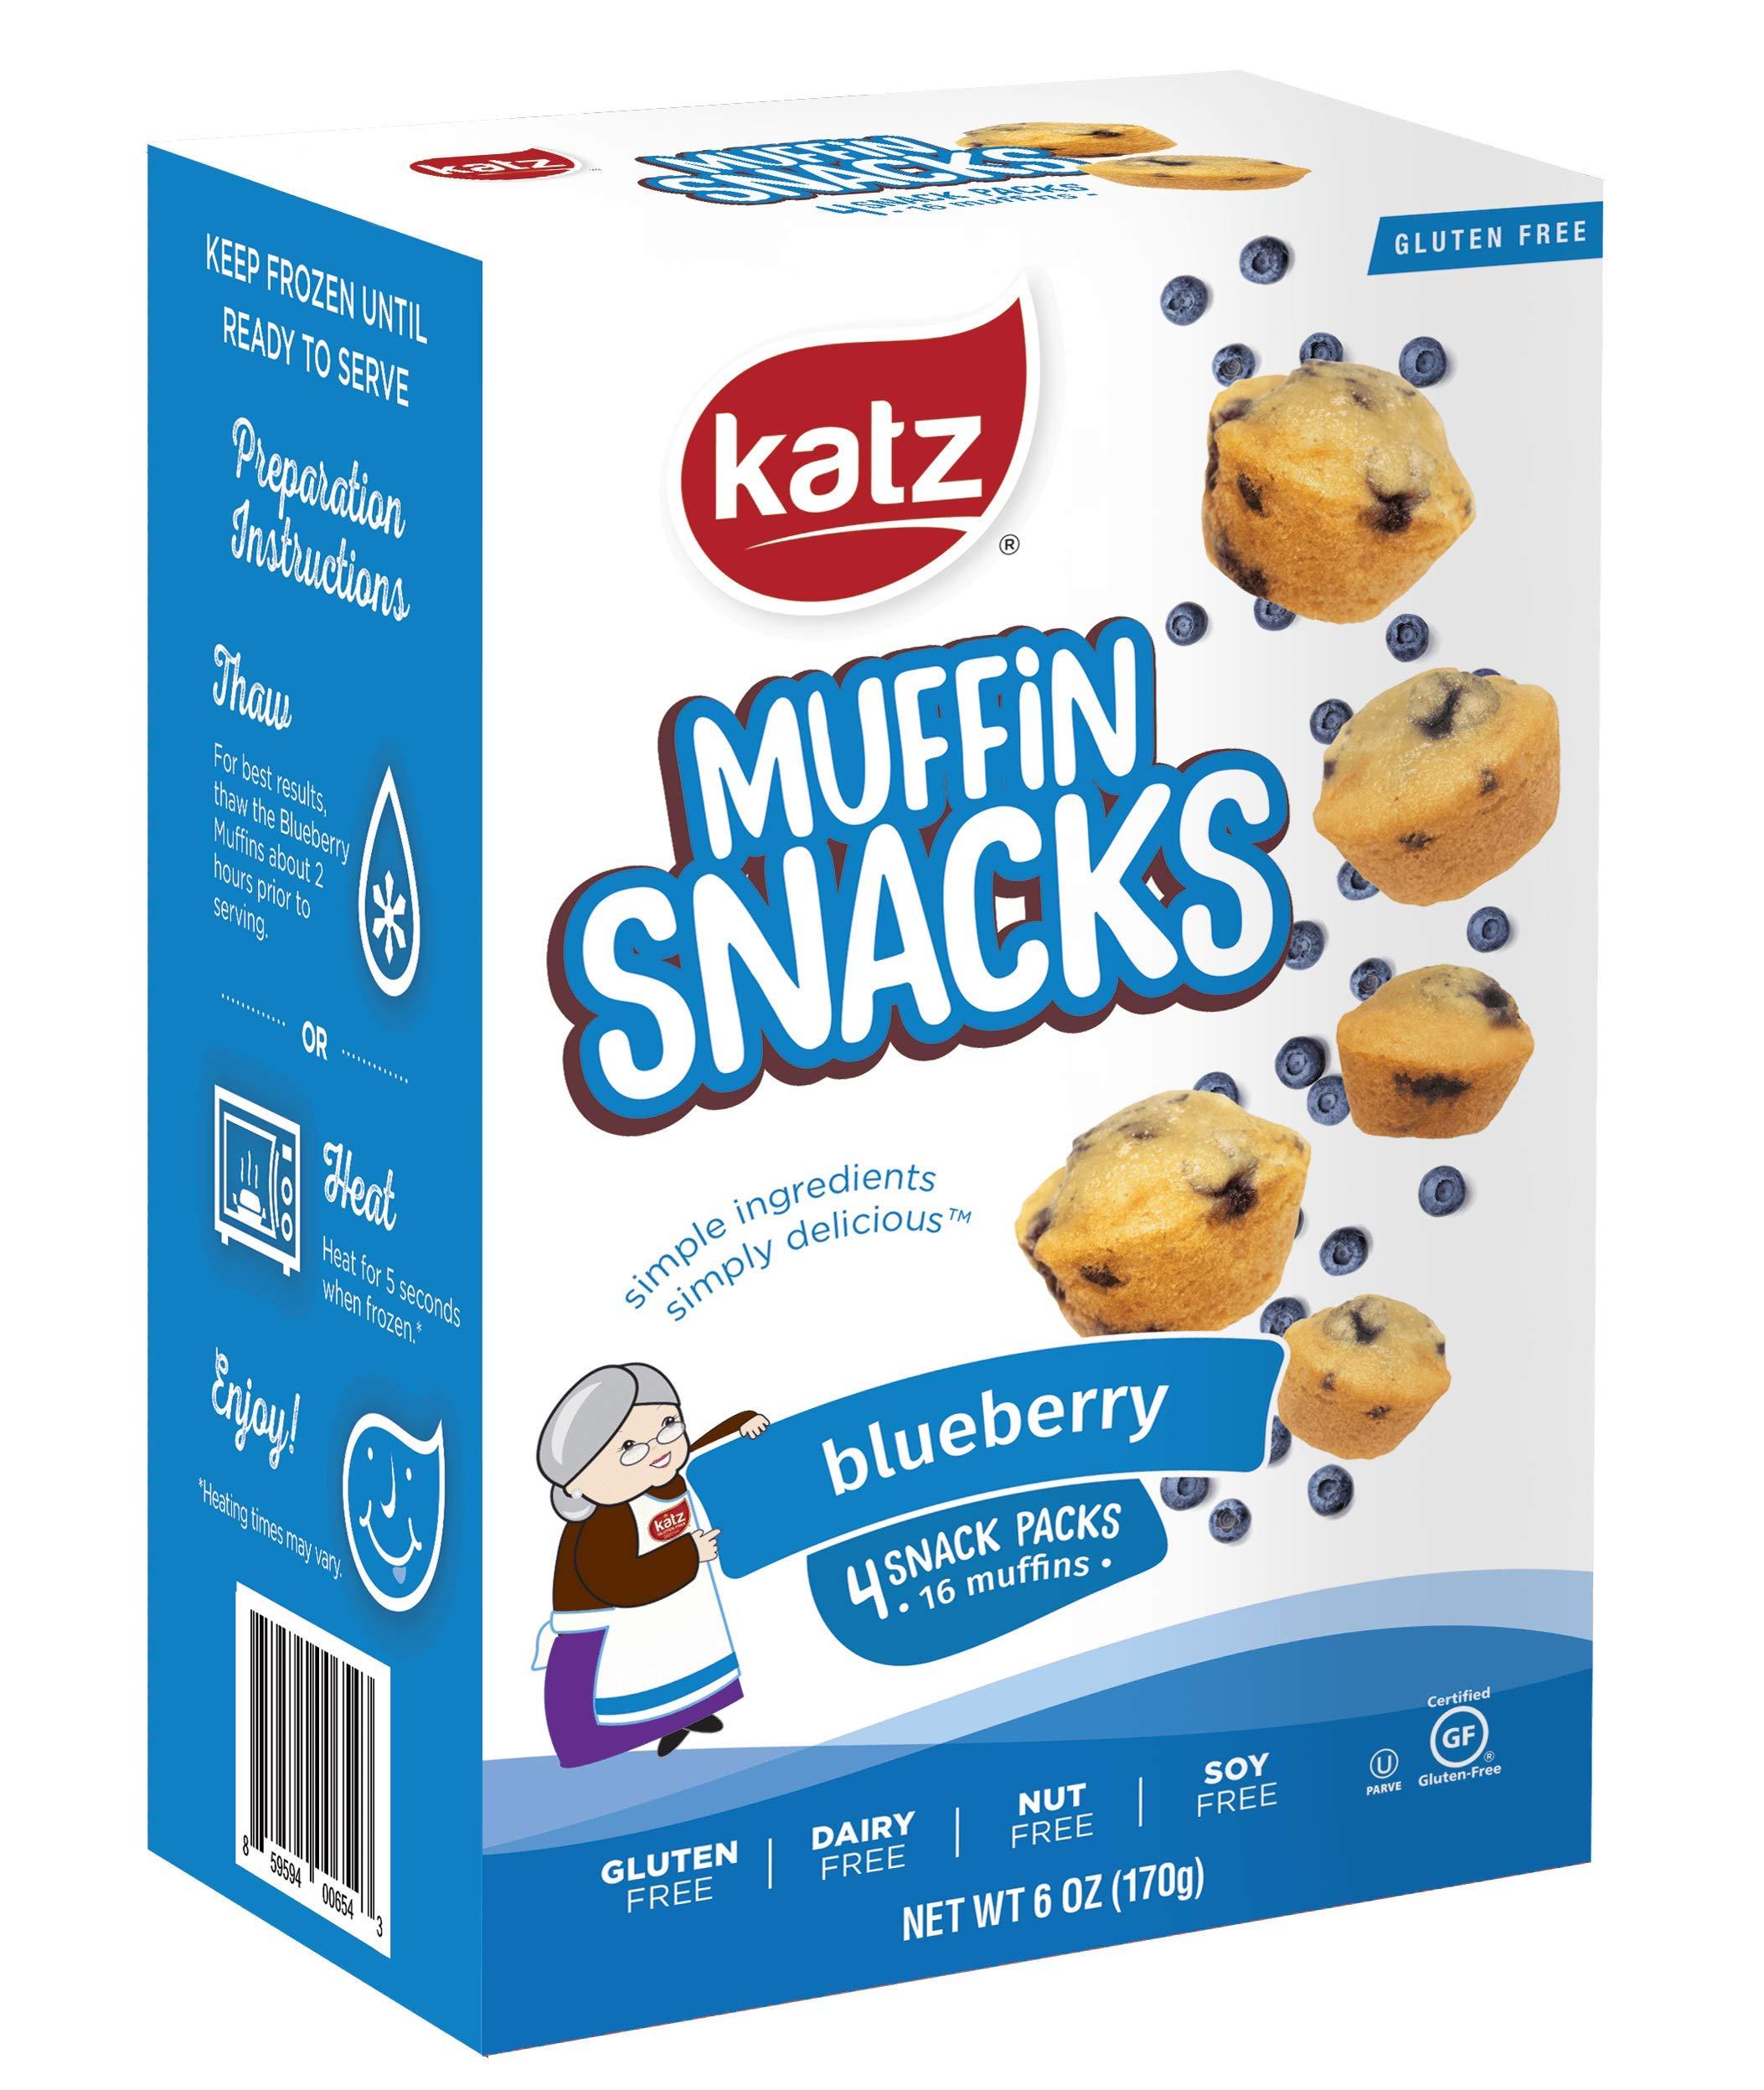 Katz Gluten Free Blueberry Muffin Snacks   Dairy, Nut, Soy and Gluten Free   Kosher (6 Packs, 6 Ounce Each) by Katz Gluten Free